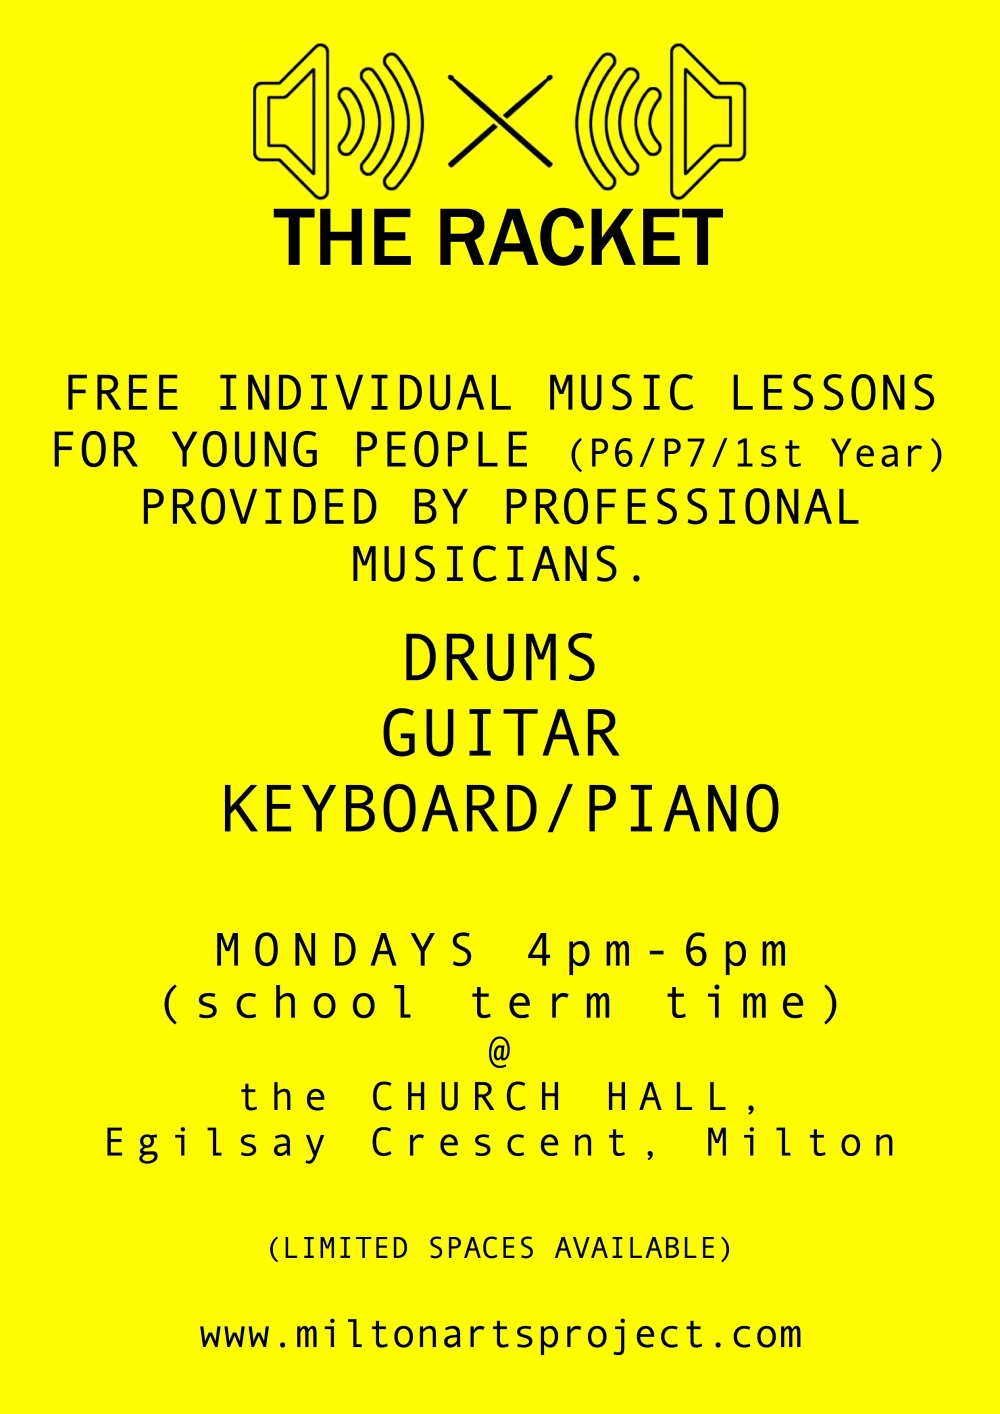 Racket Poster Oct 2017